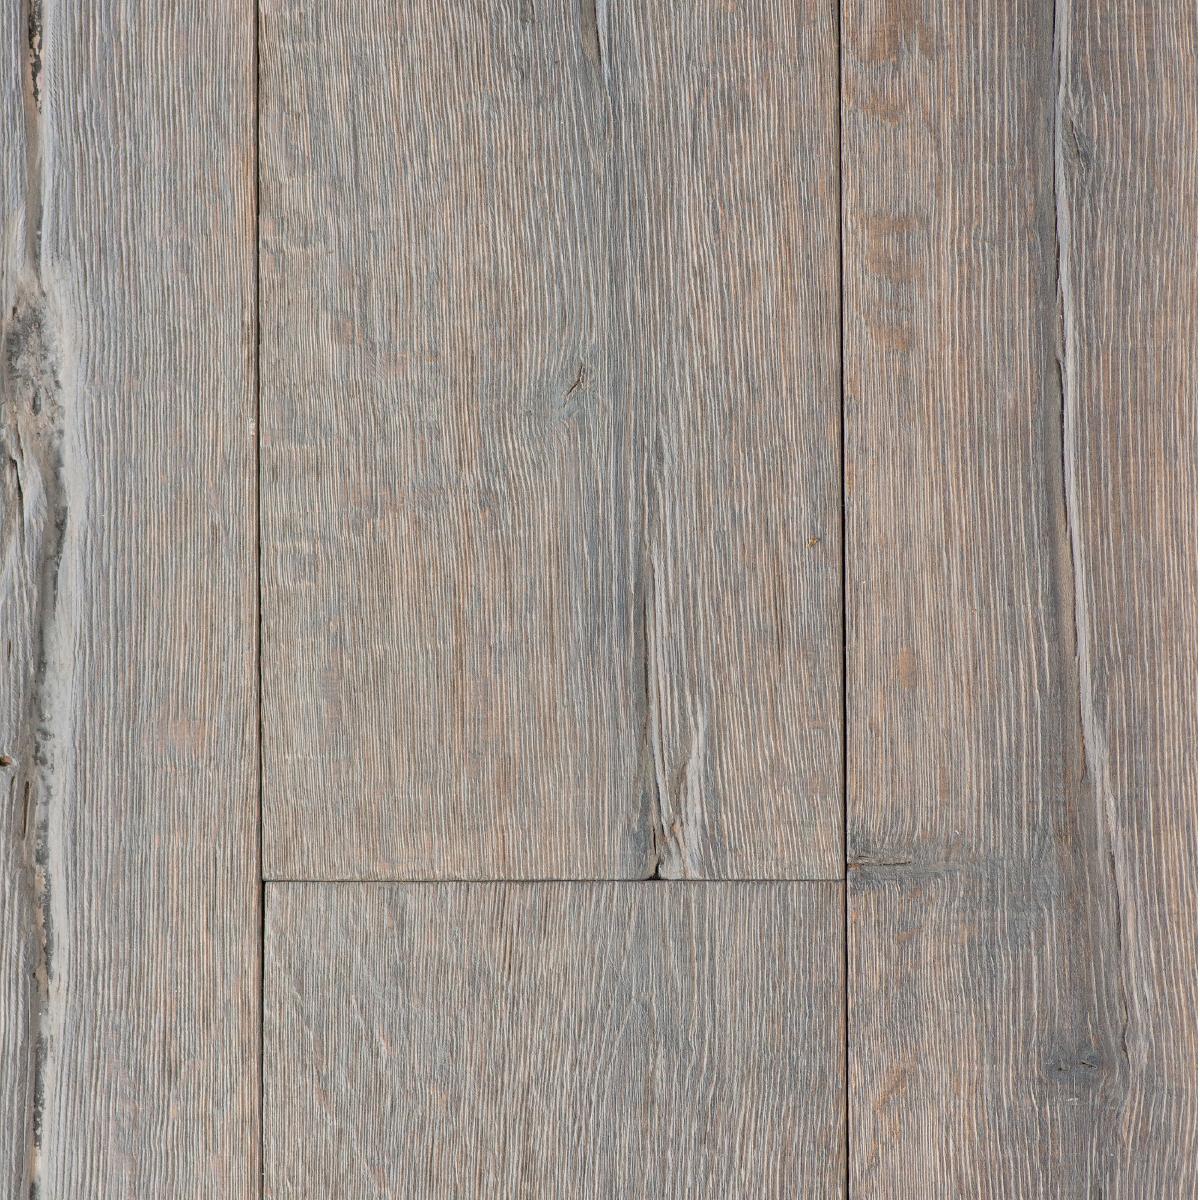 SQdark-heavy-wood-01.png